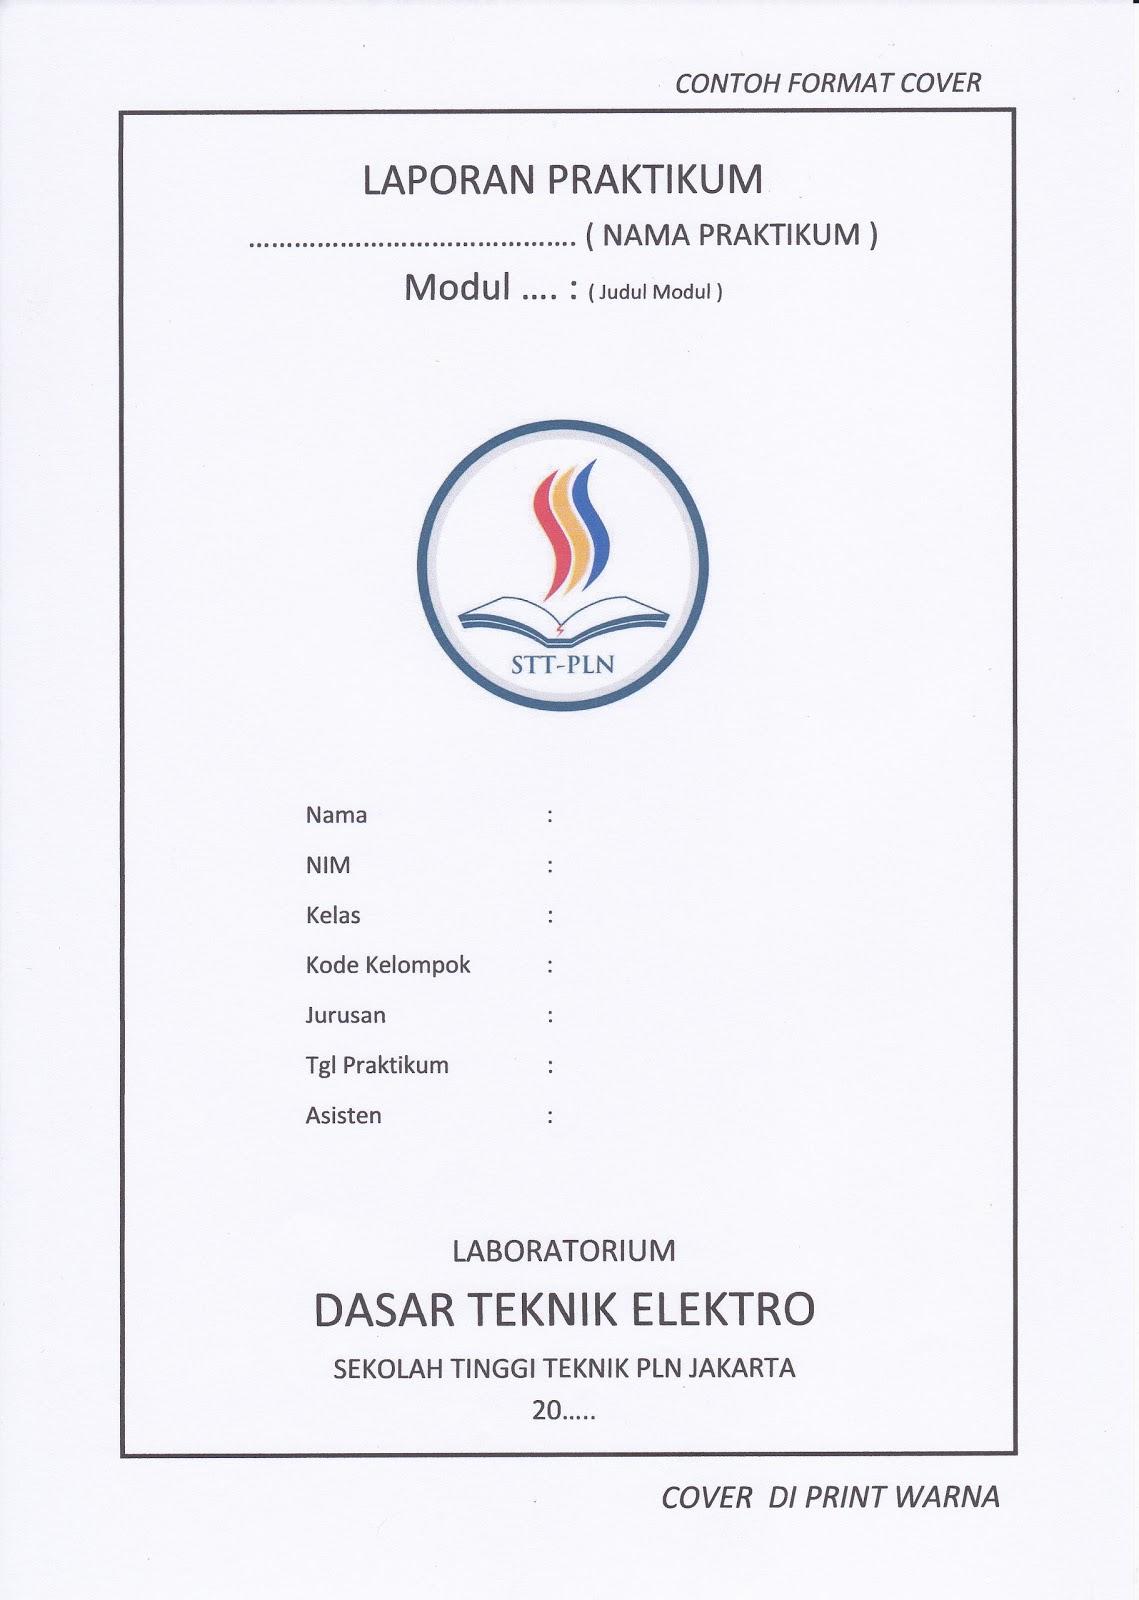 Contoh Cover Laporan Praktikum Loak Info